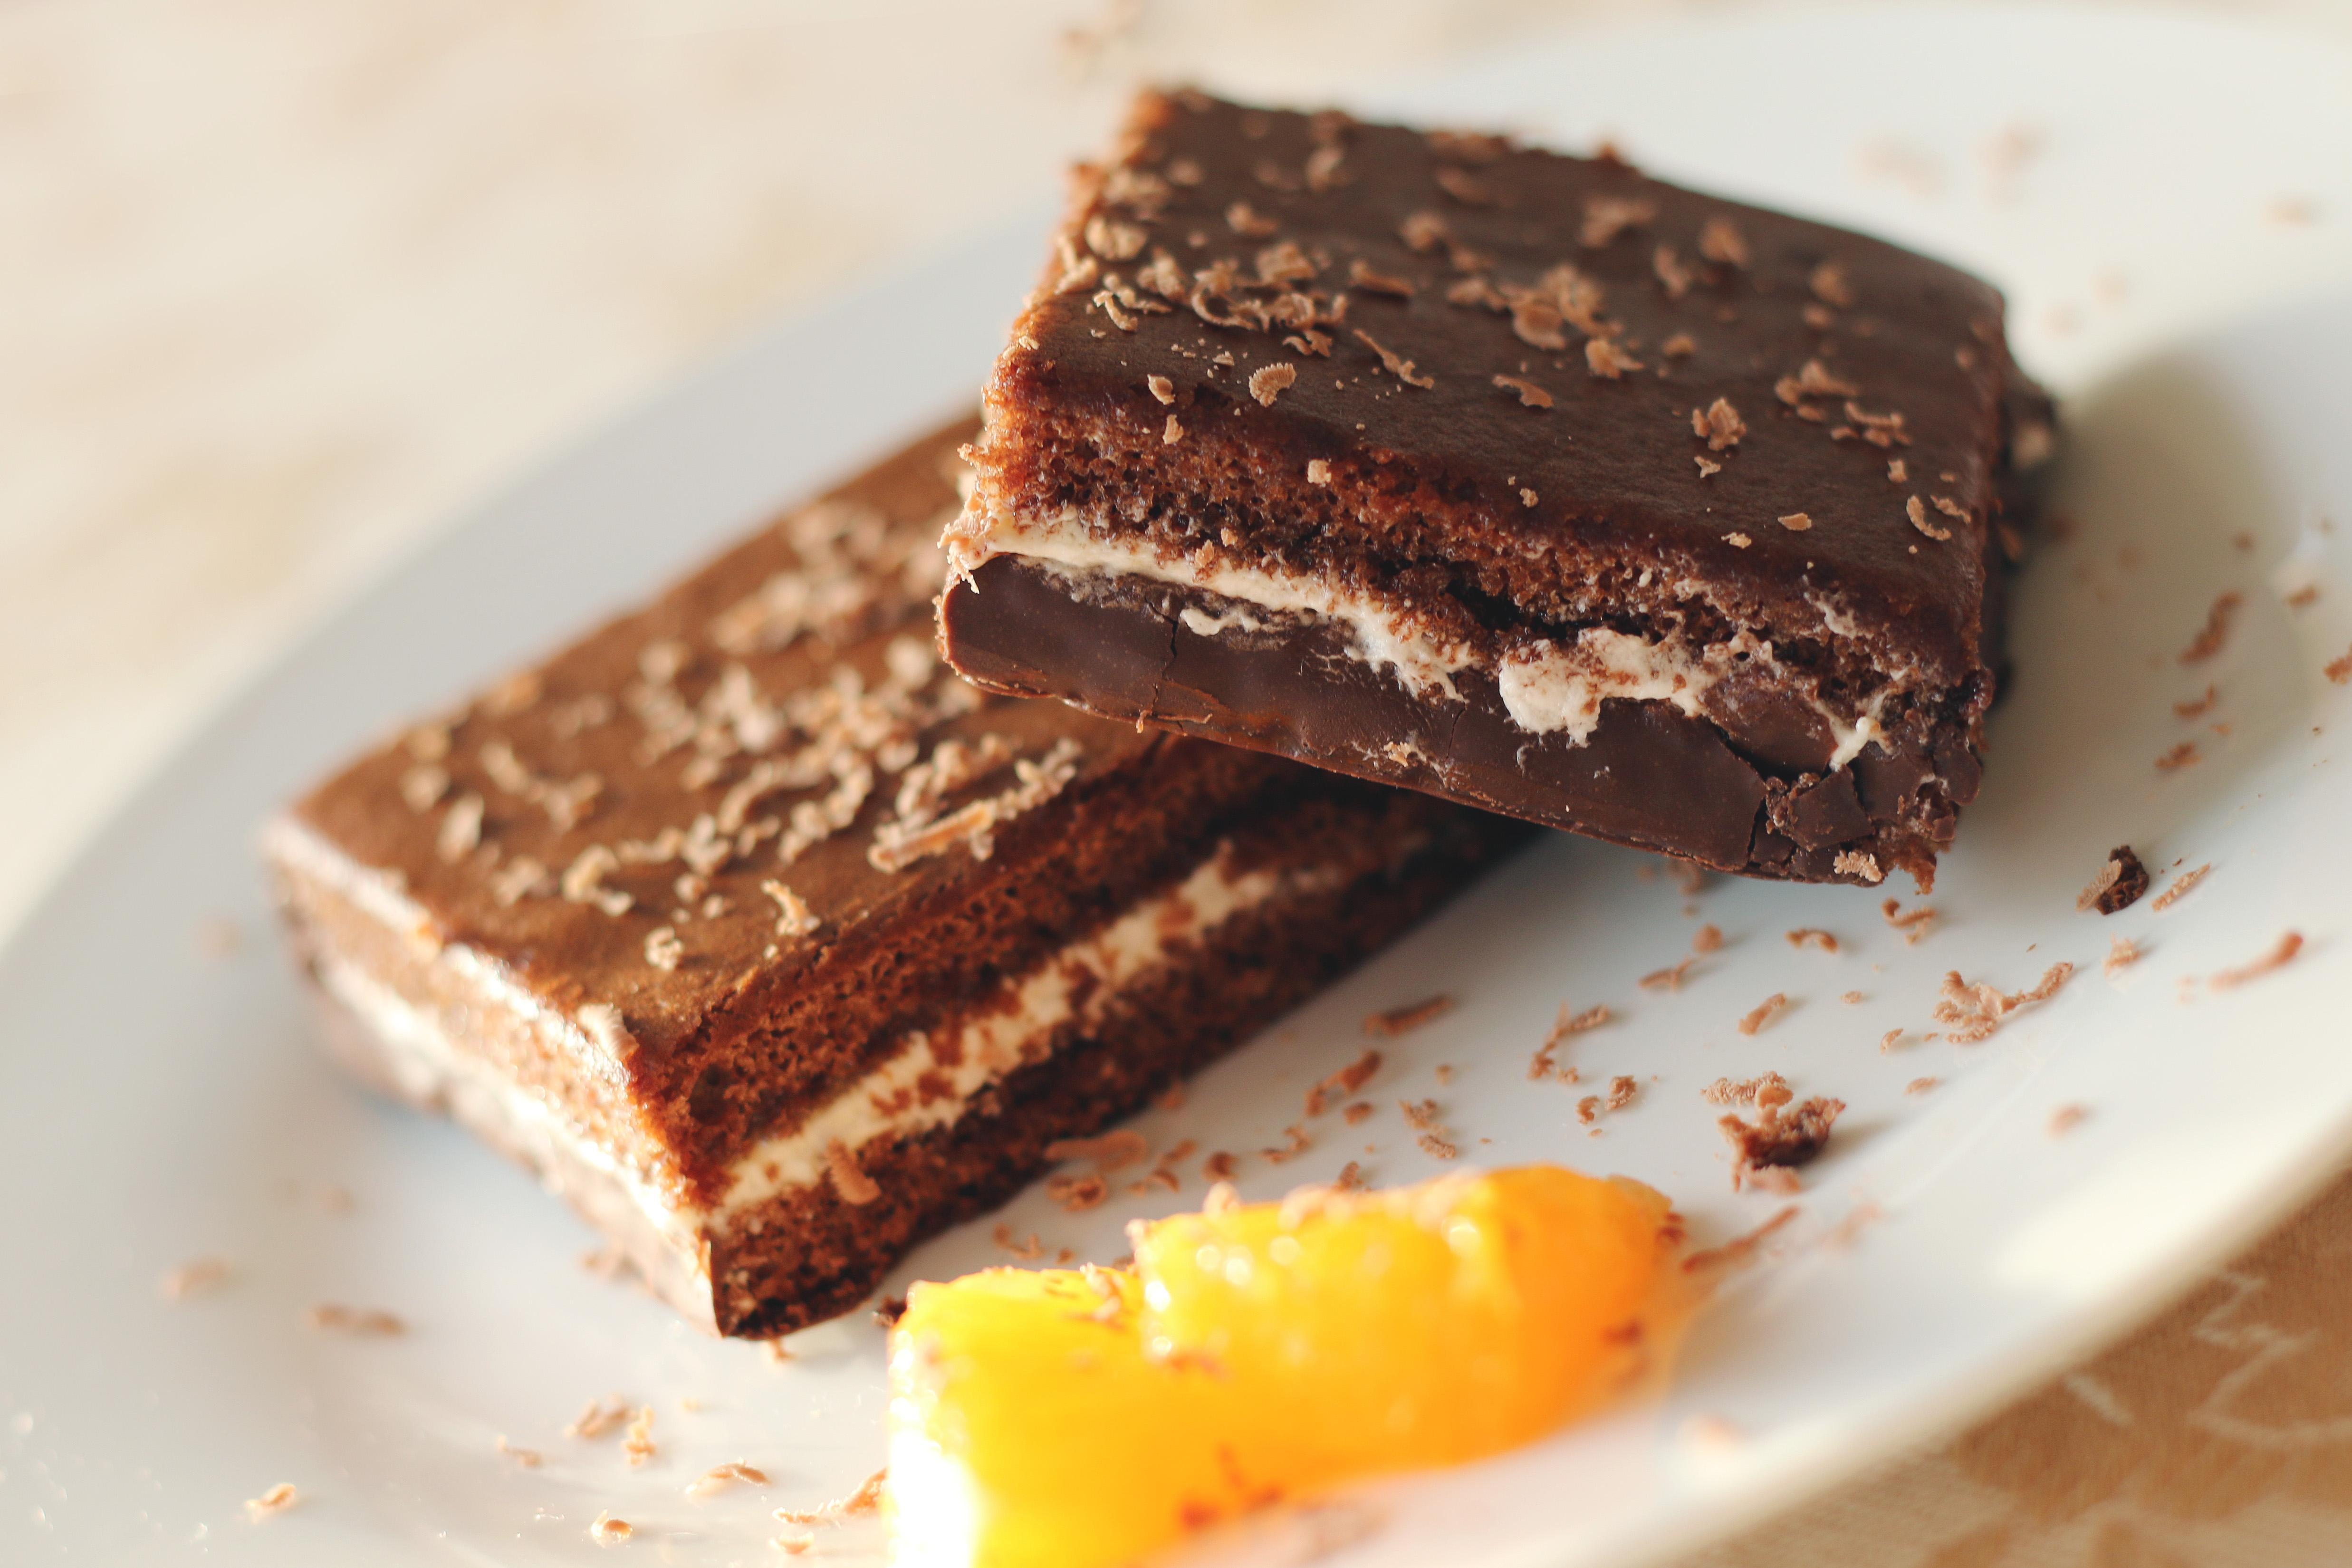 Chocolate Cake Images Dessert : Free stock photo of brownies, cake, chocolate